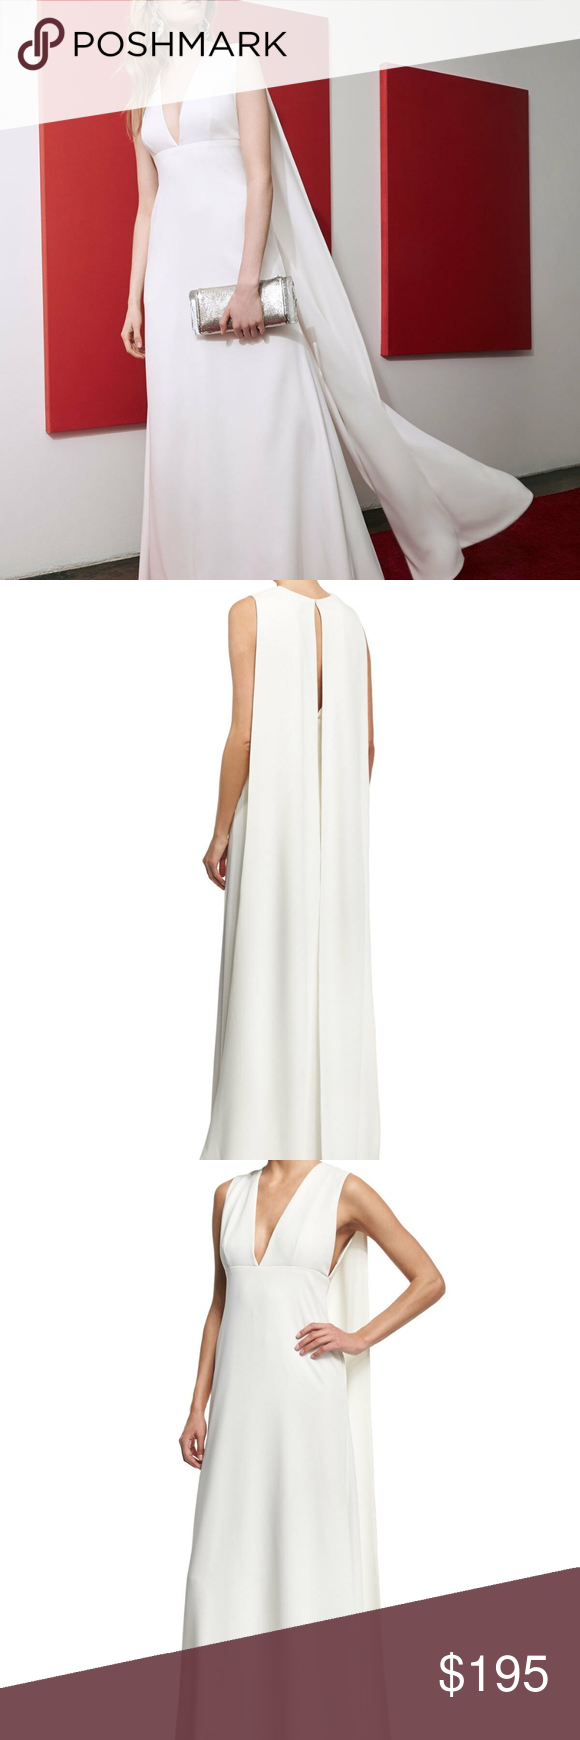 Jill Jill Stuart Sleeveless V Neck Cape Gown Belted Shift Dress Jill Stuart Dress Cape Gown [ 1740 x 580 Pixel ]